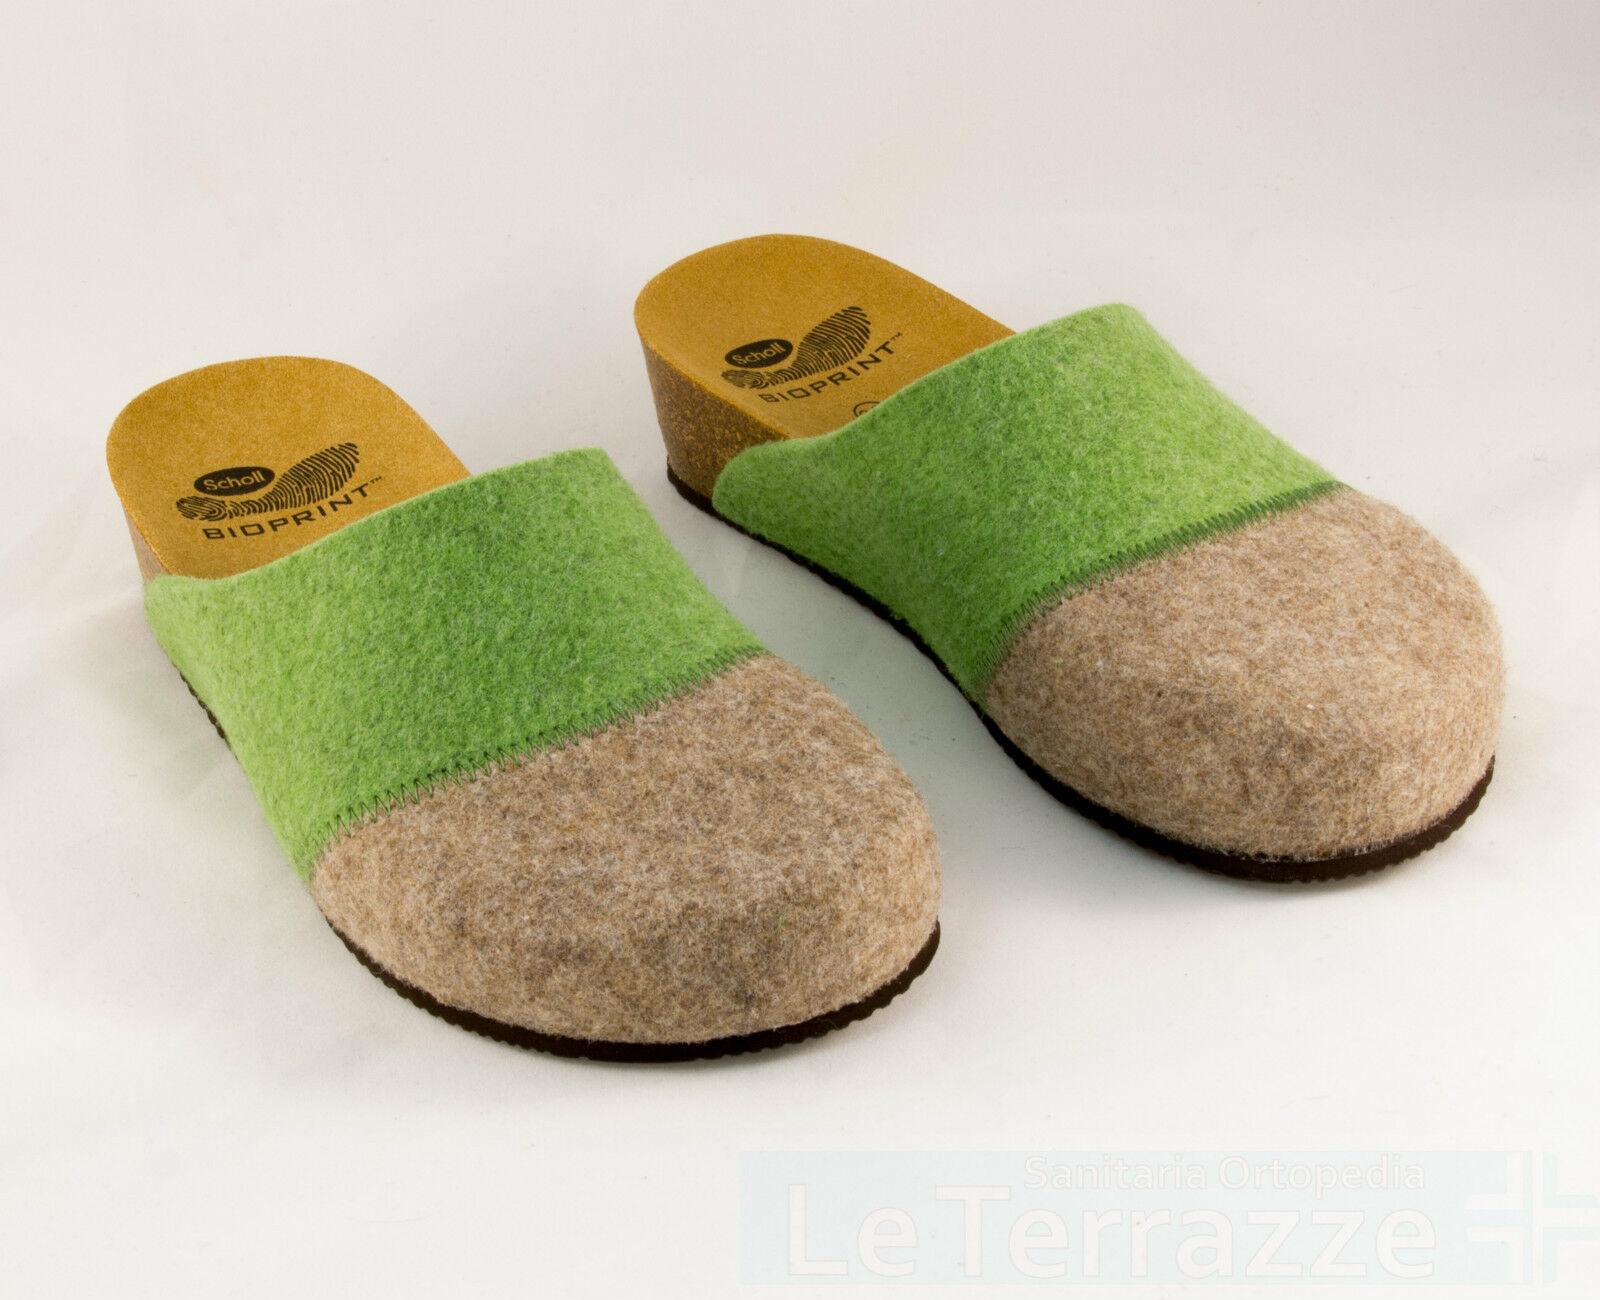 0151658e0a Dr Scholl Flaine sabout pantofola scarpa ciabatta bioprint sconto 20 ...